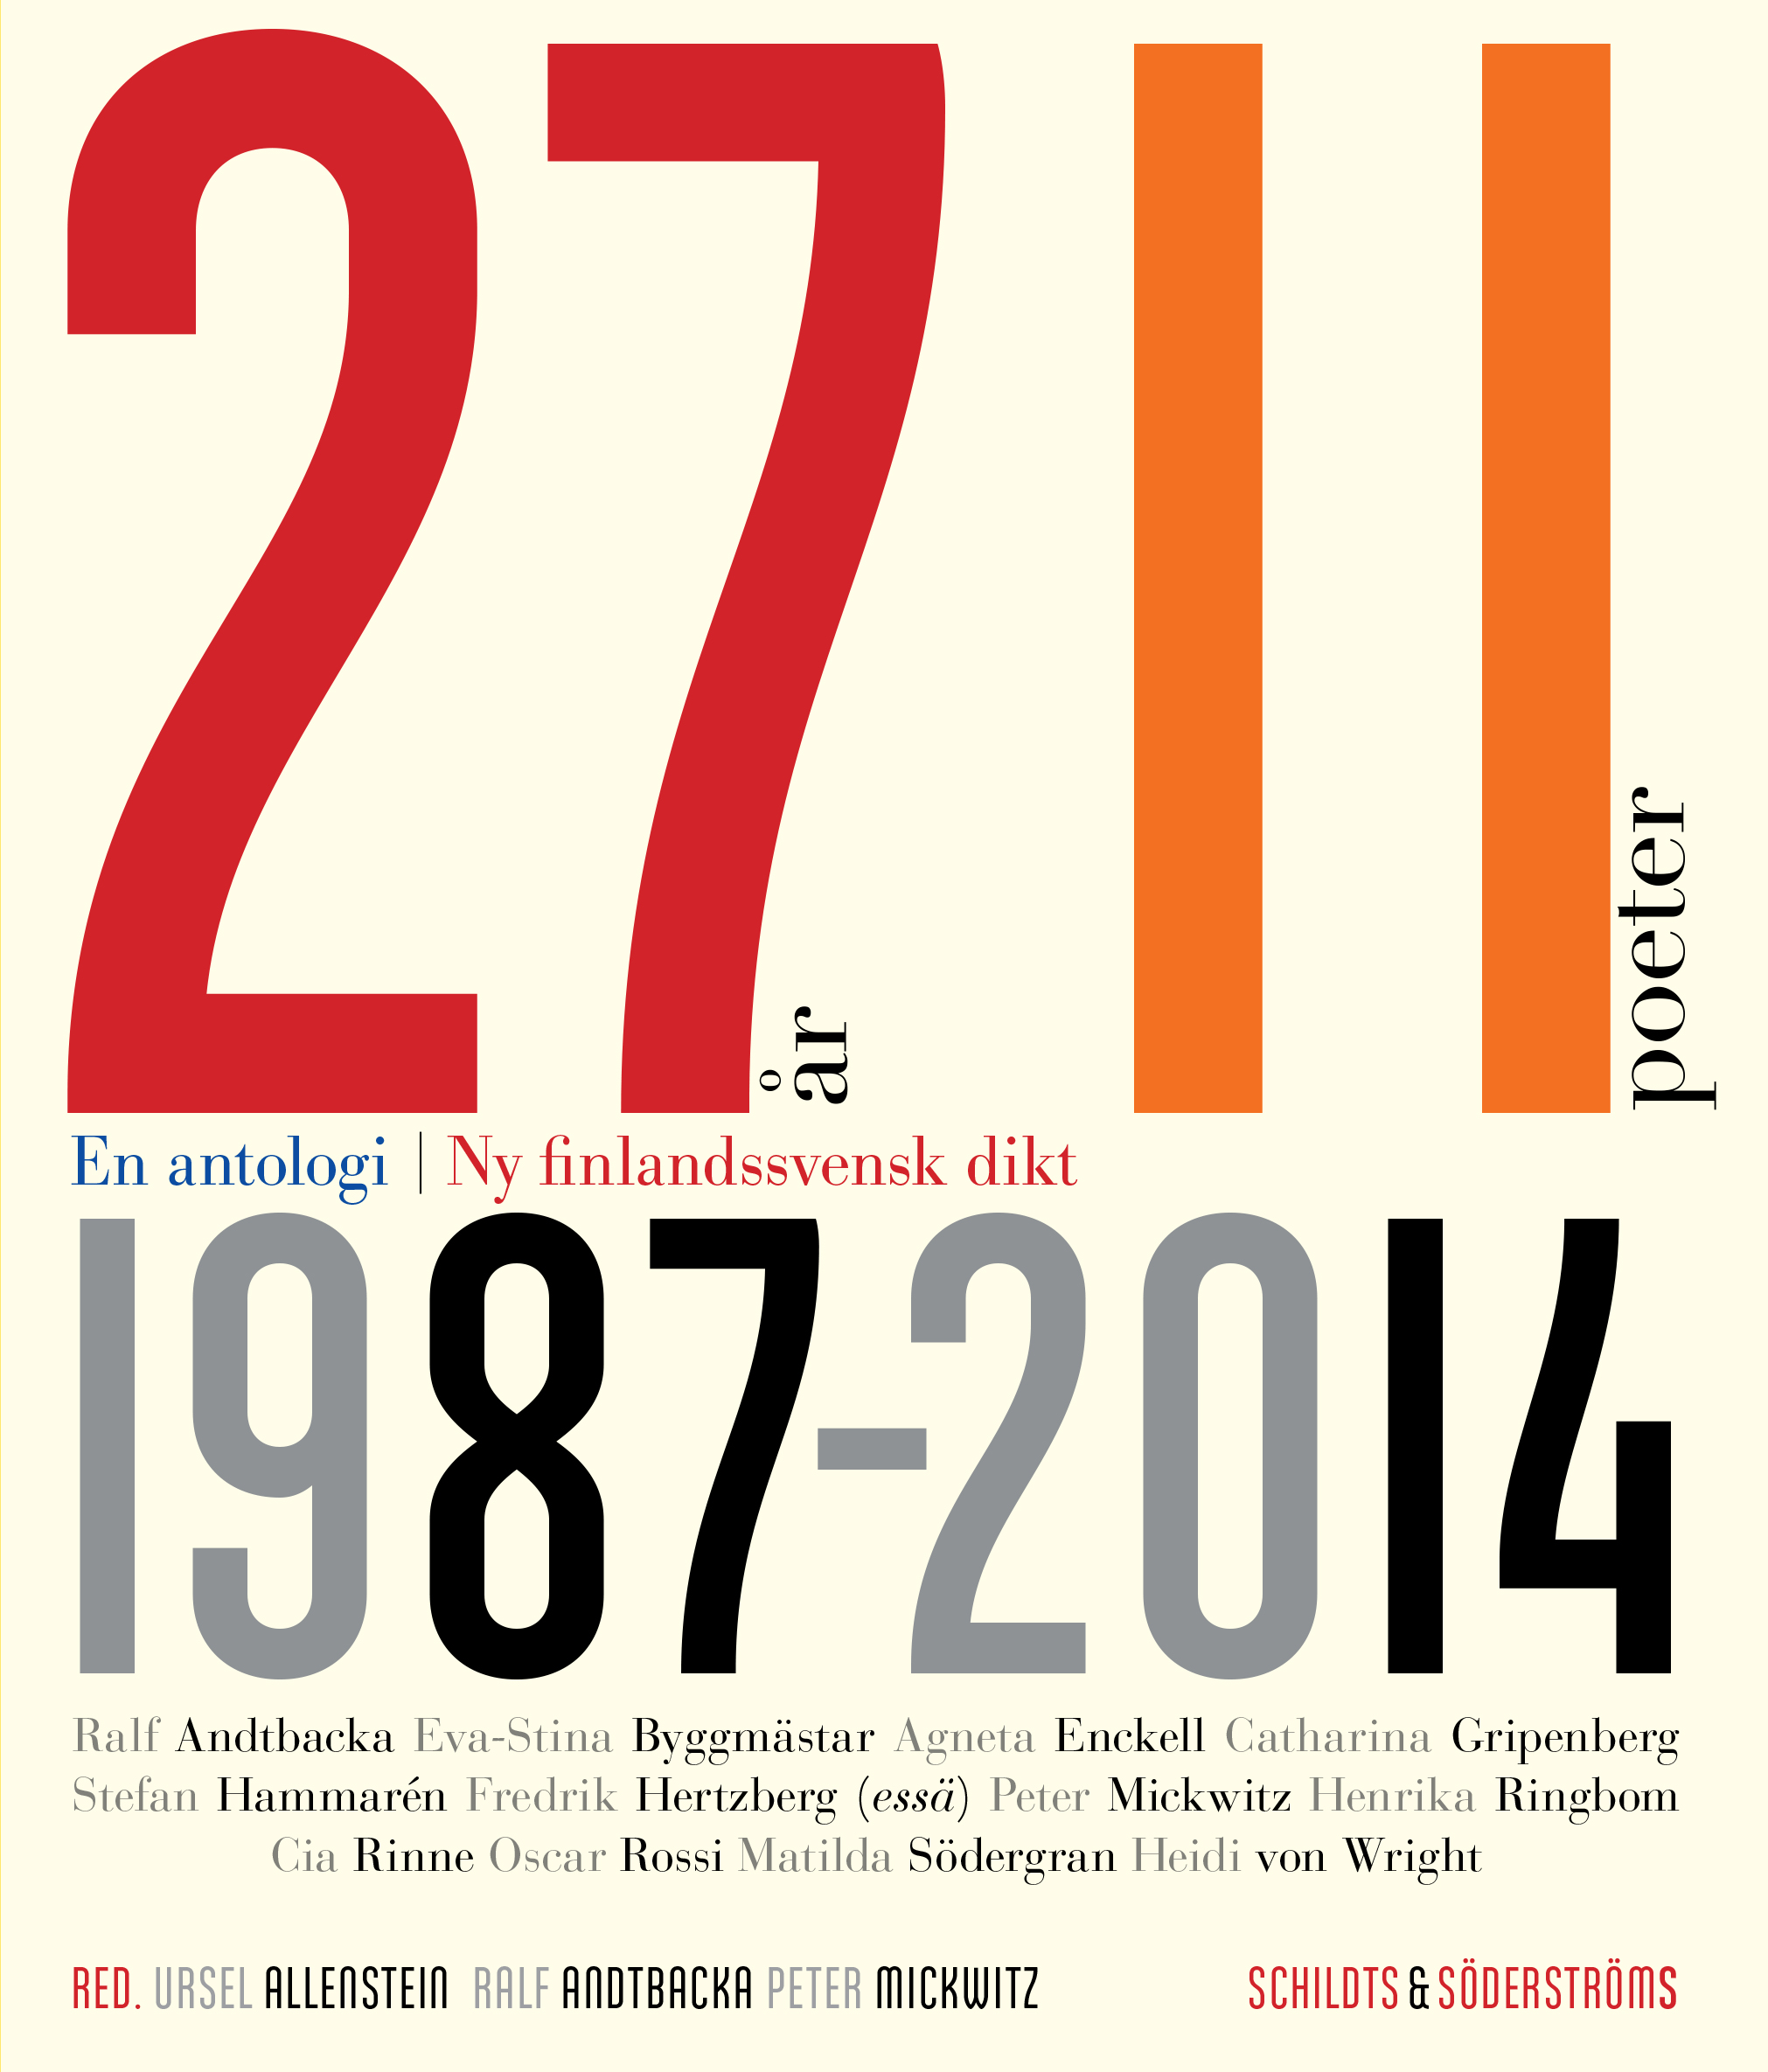 Ursel Allenstein & Ralf Andtbacka & Peter Mickwitz (red.): 27 år, elva poeter, en antologi. Ny finlandssvensk dikt 1987-2014 (Schildts og Söderströms, 2014)